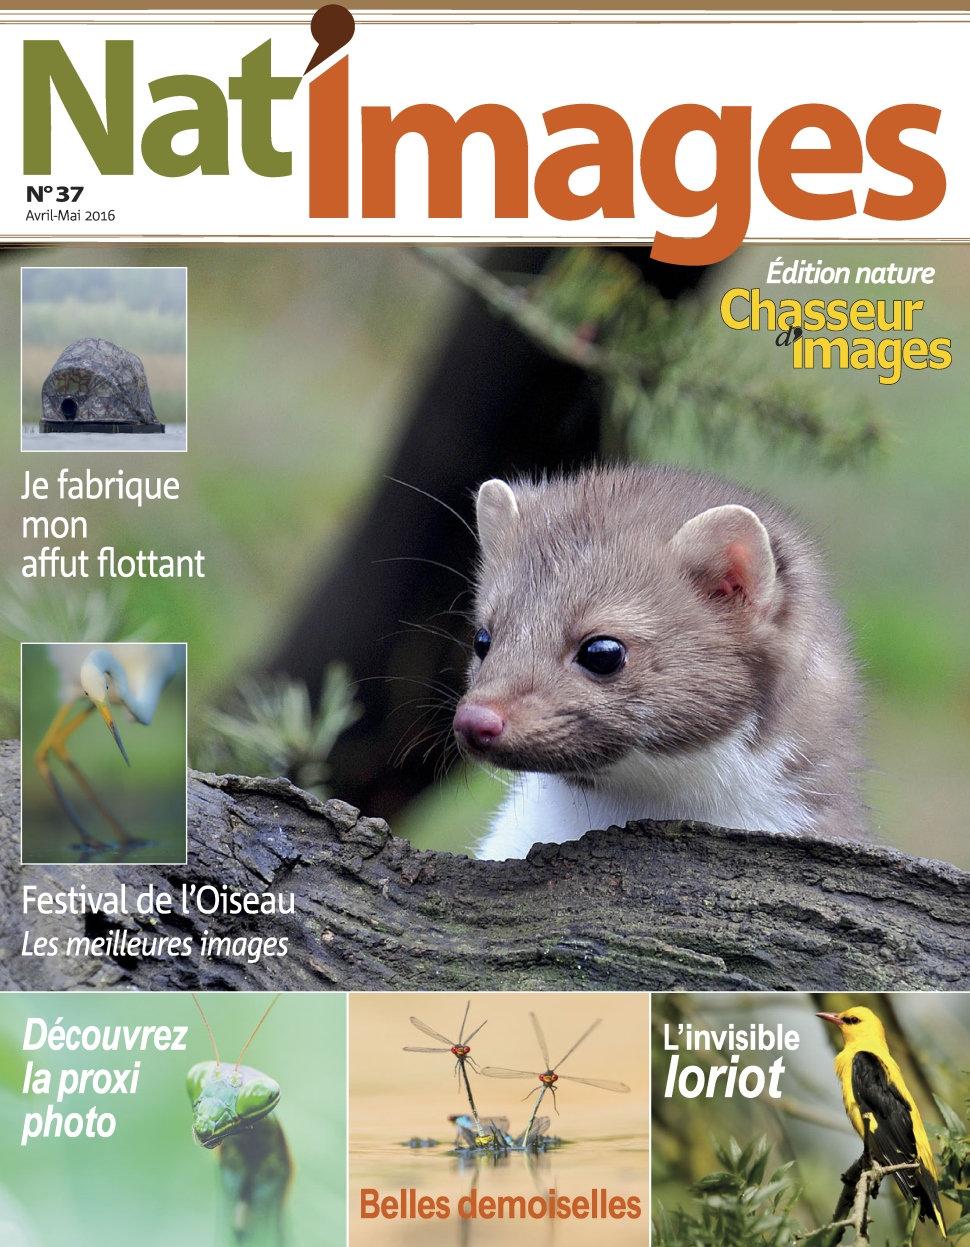 Nat'Images N°37 - Avril/Mai 2016